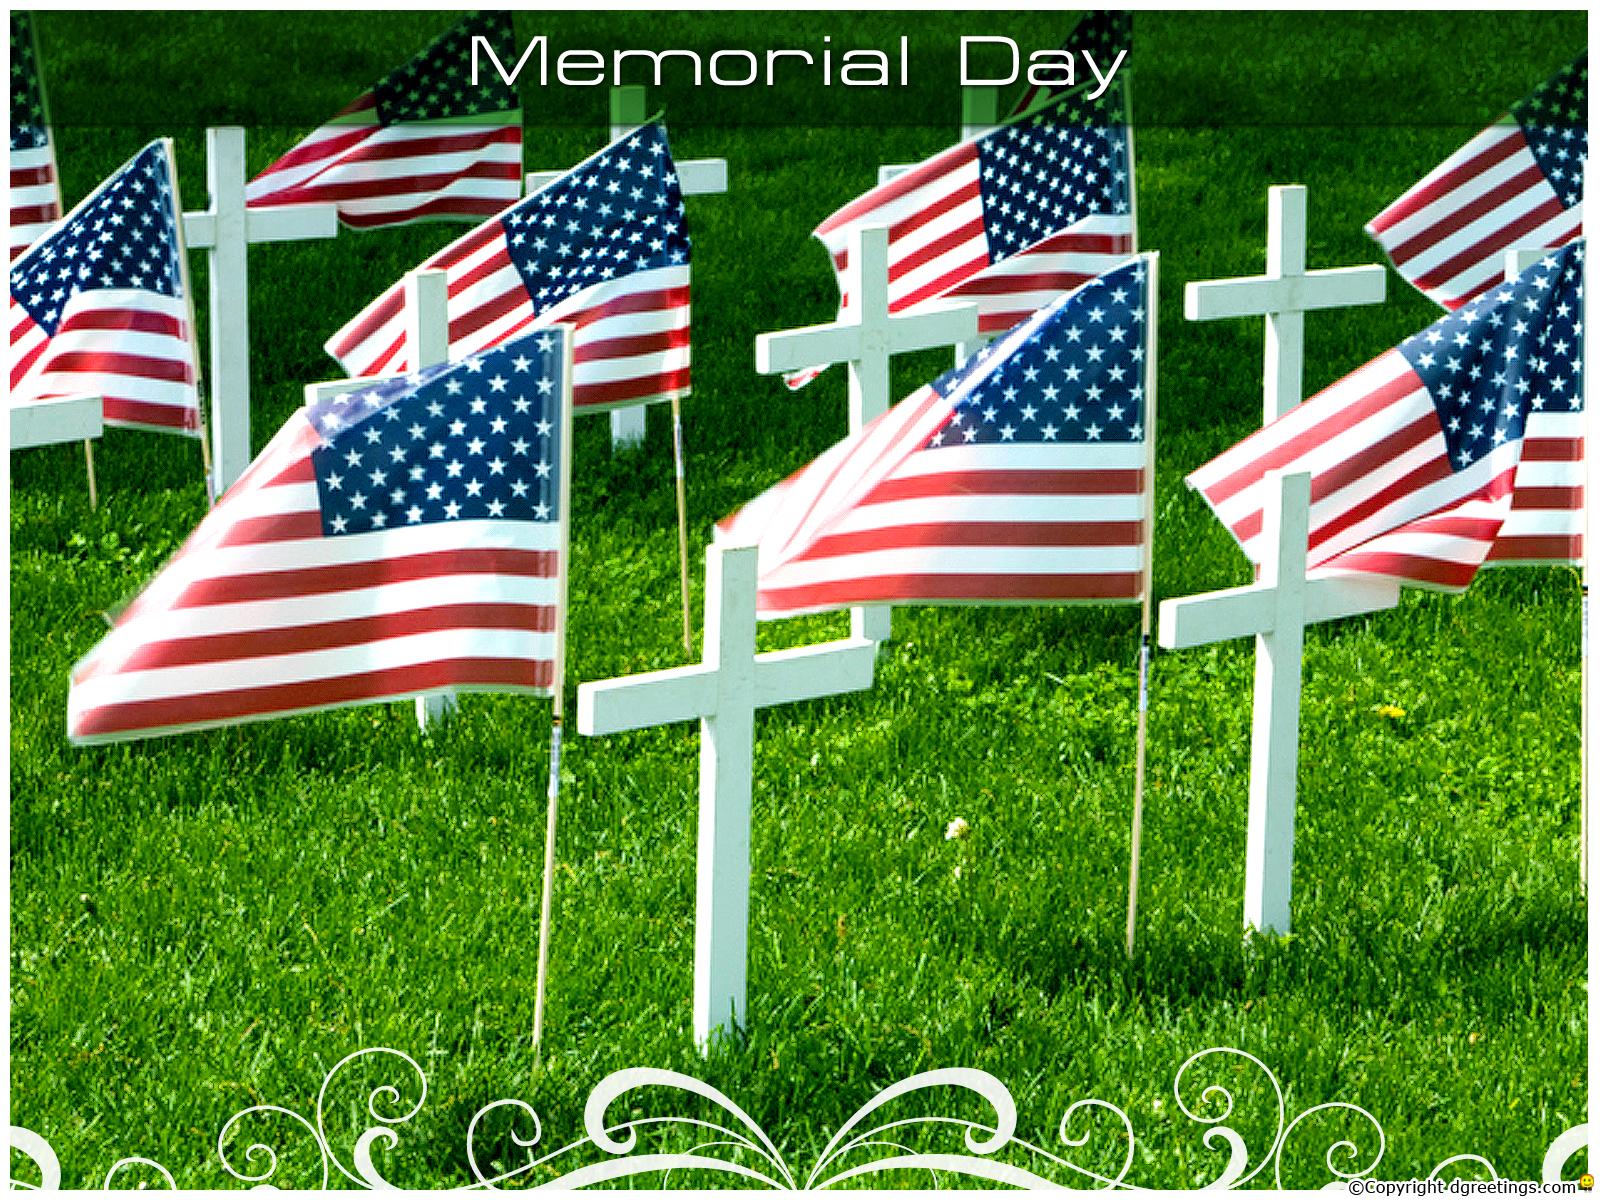 Free Download Memorial Day Wallpapers